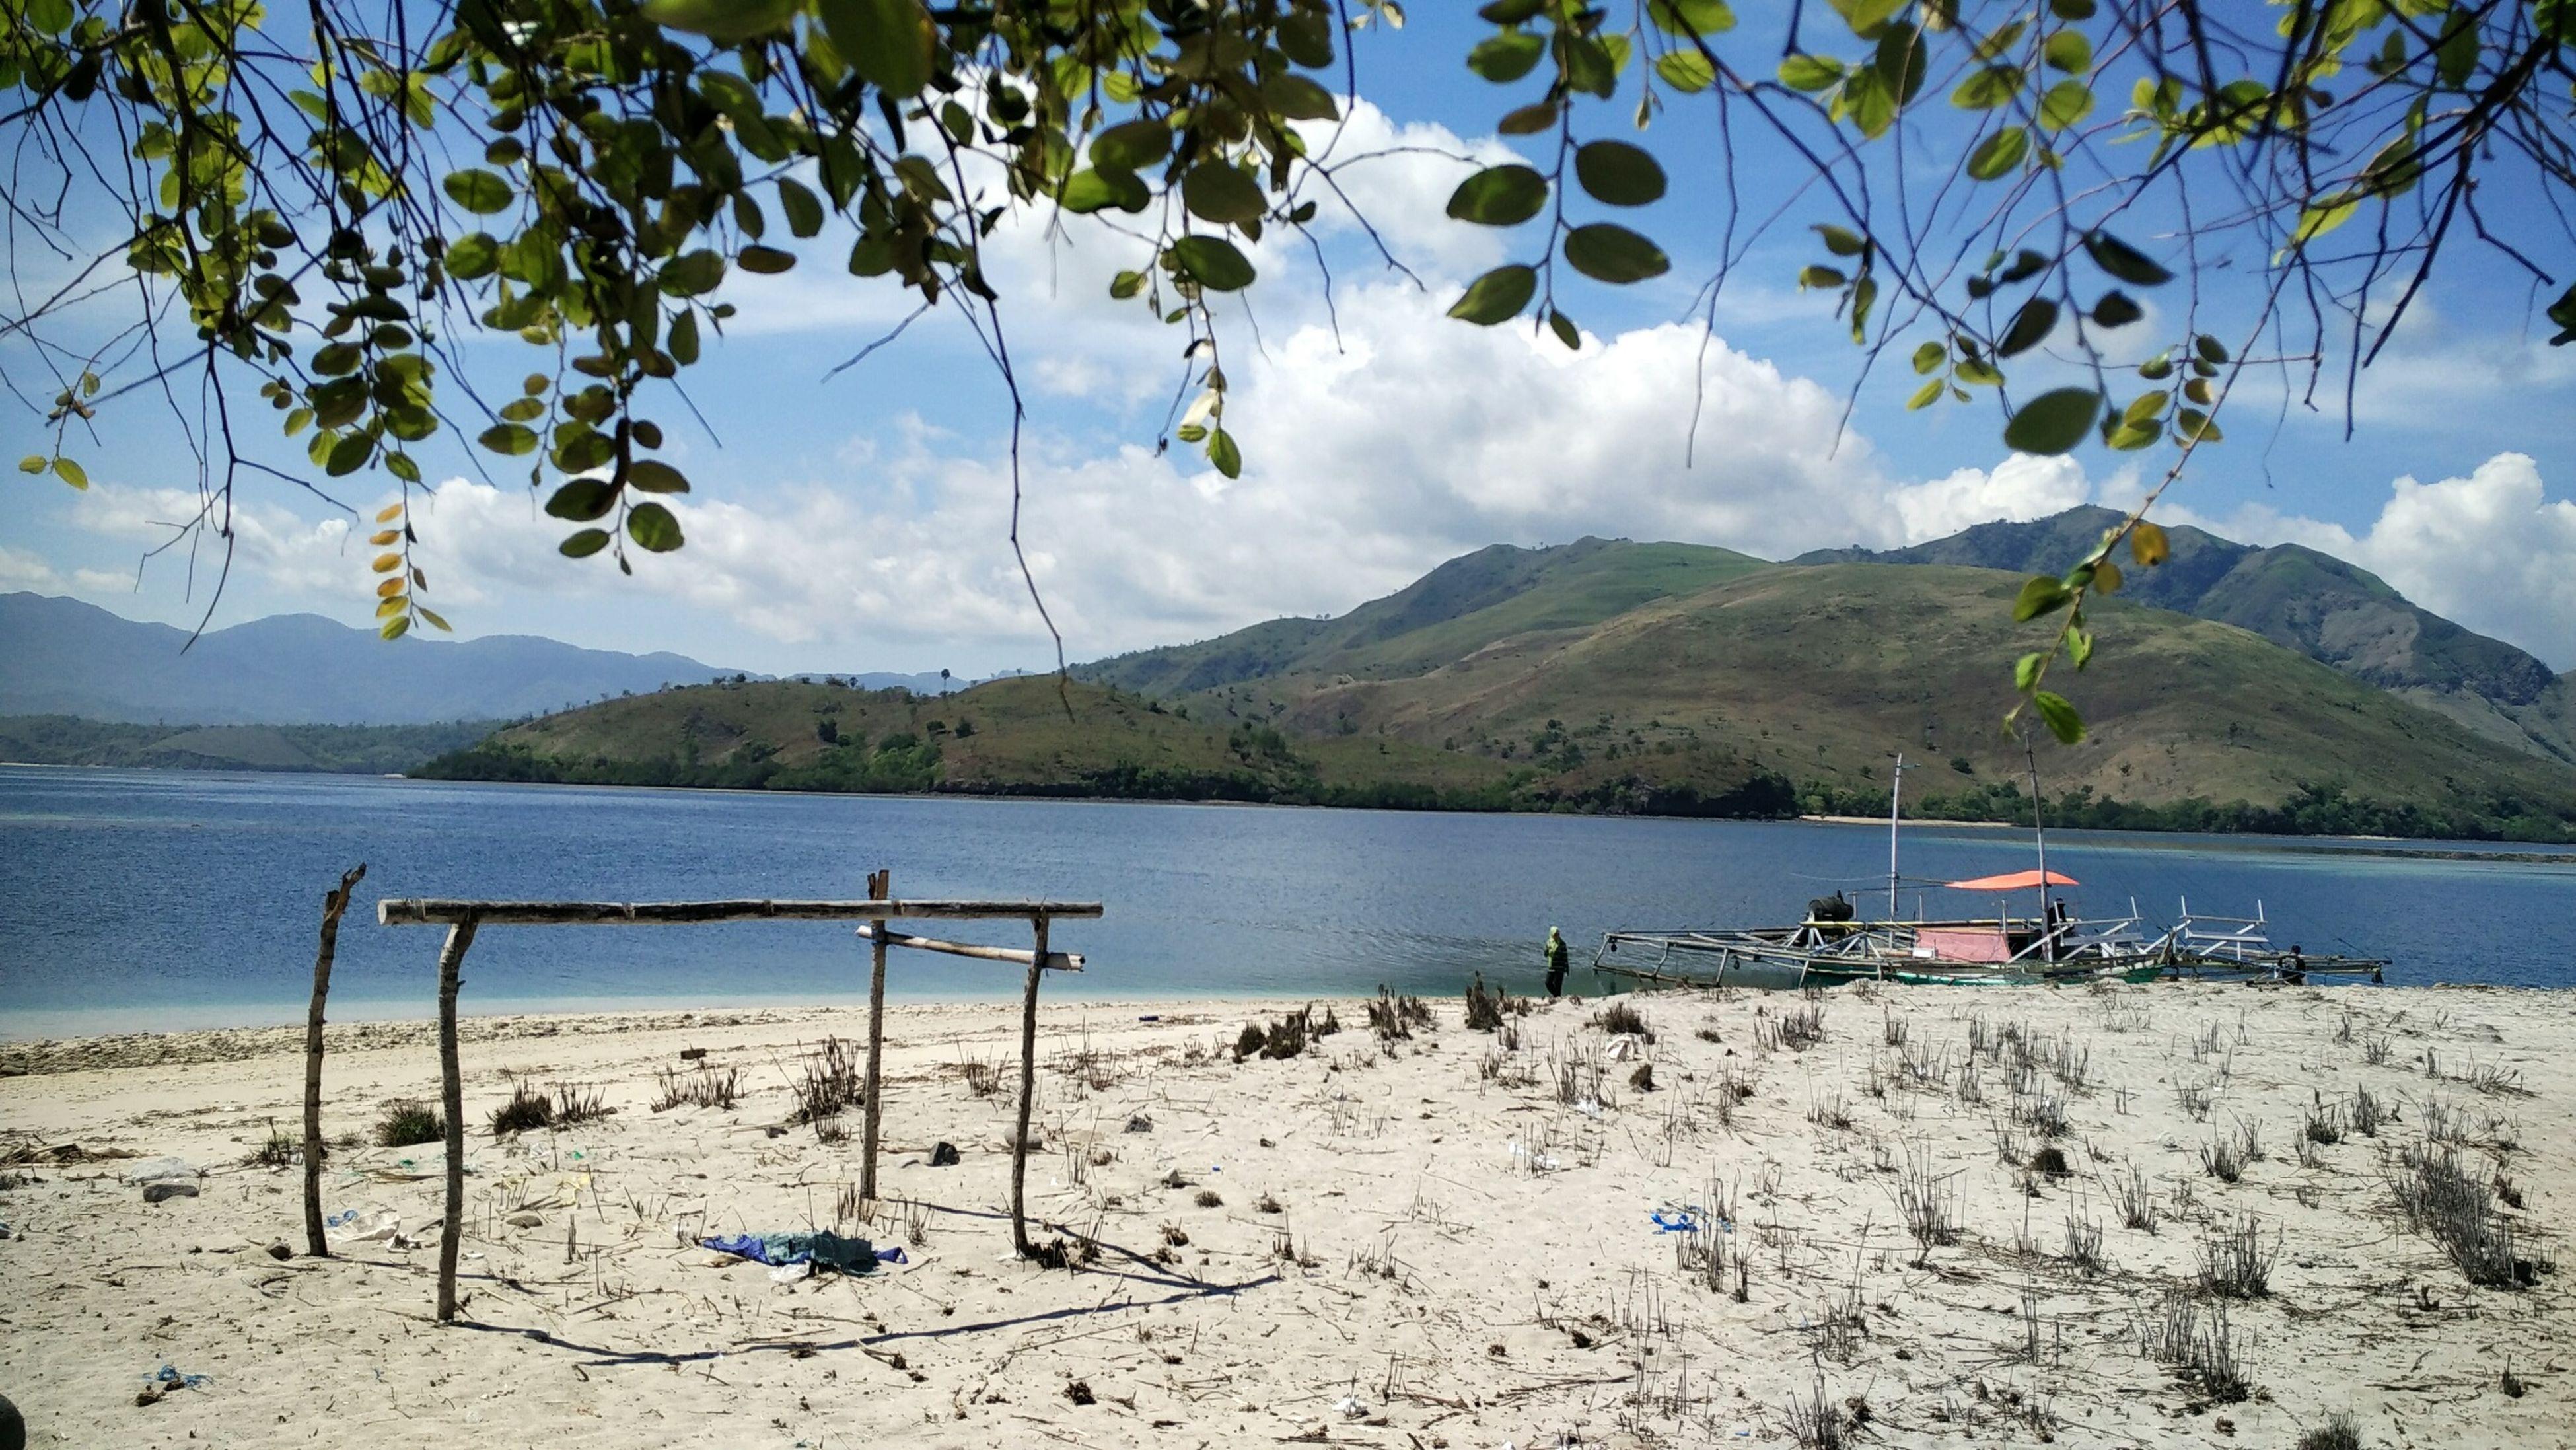 mountain, water, sky, mountain range, tranquility, tranquil scene, beach, scenics, beauty in nature, nature, sea, shore, cloud - sky, sand, cloud, lake, day, blue, idyllic, tree